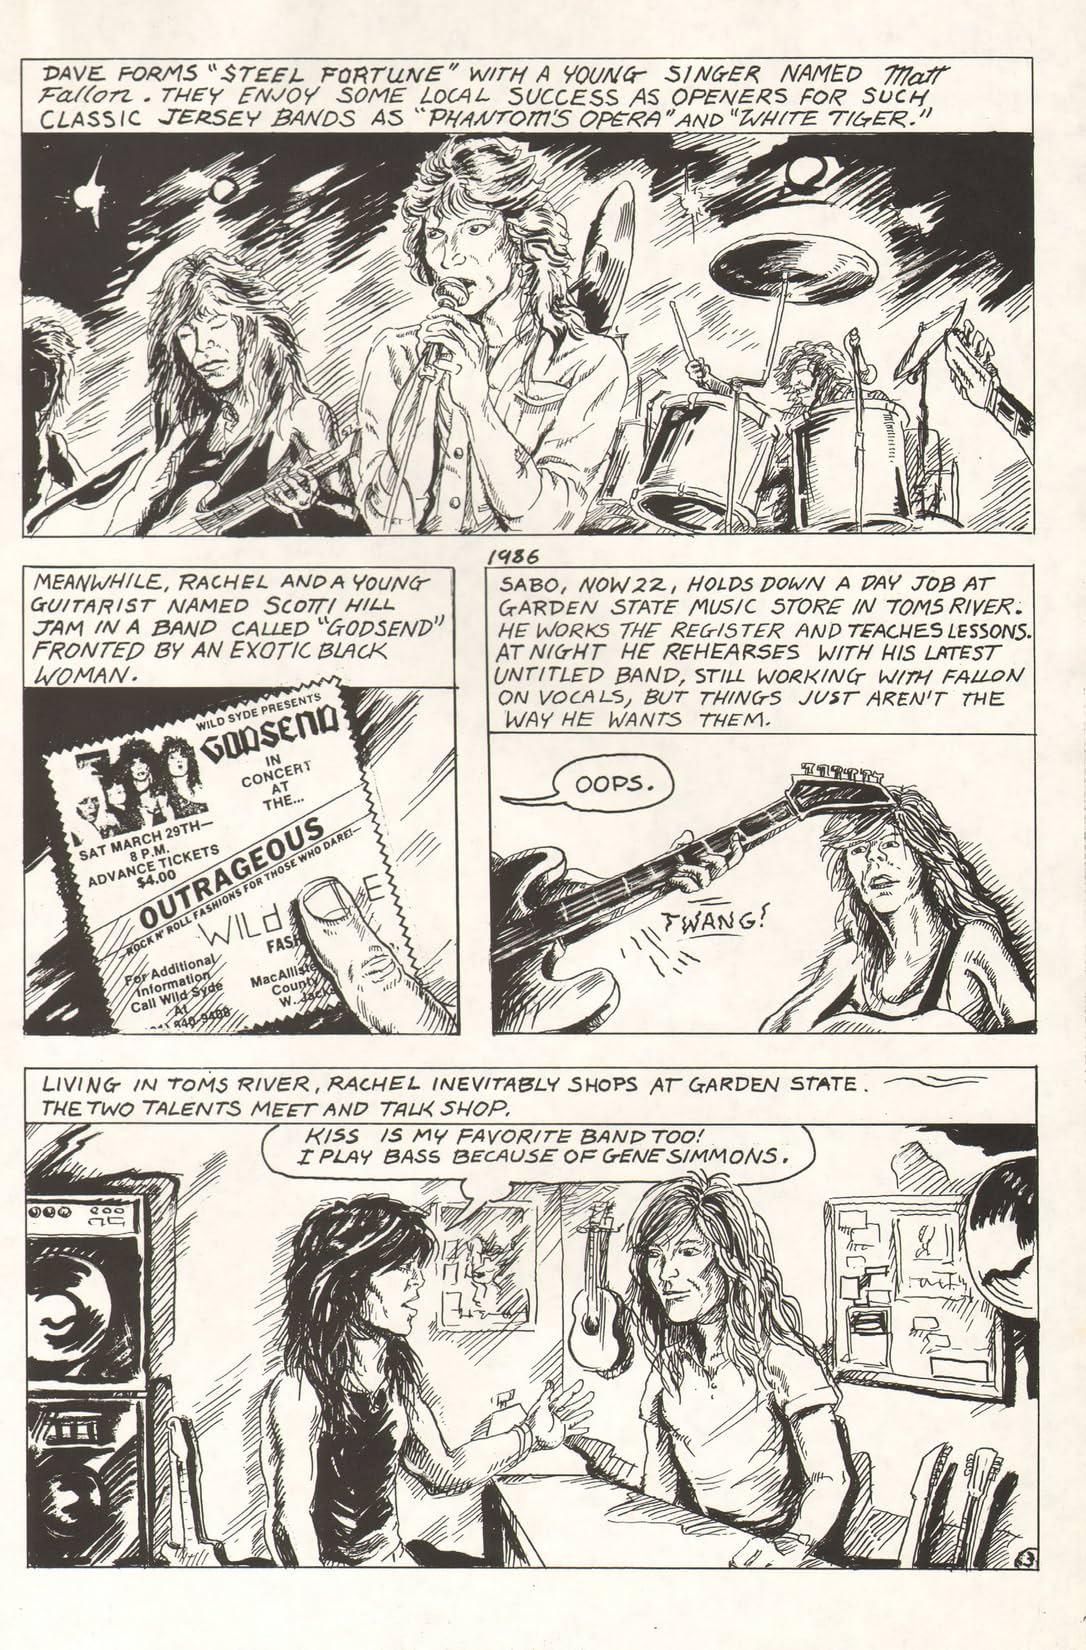 Rock N Roll Comics: Hard Rock Heroes